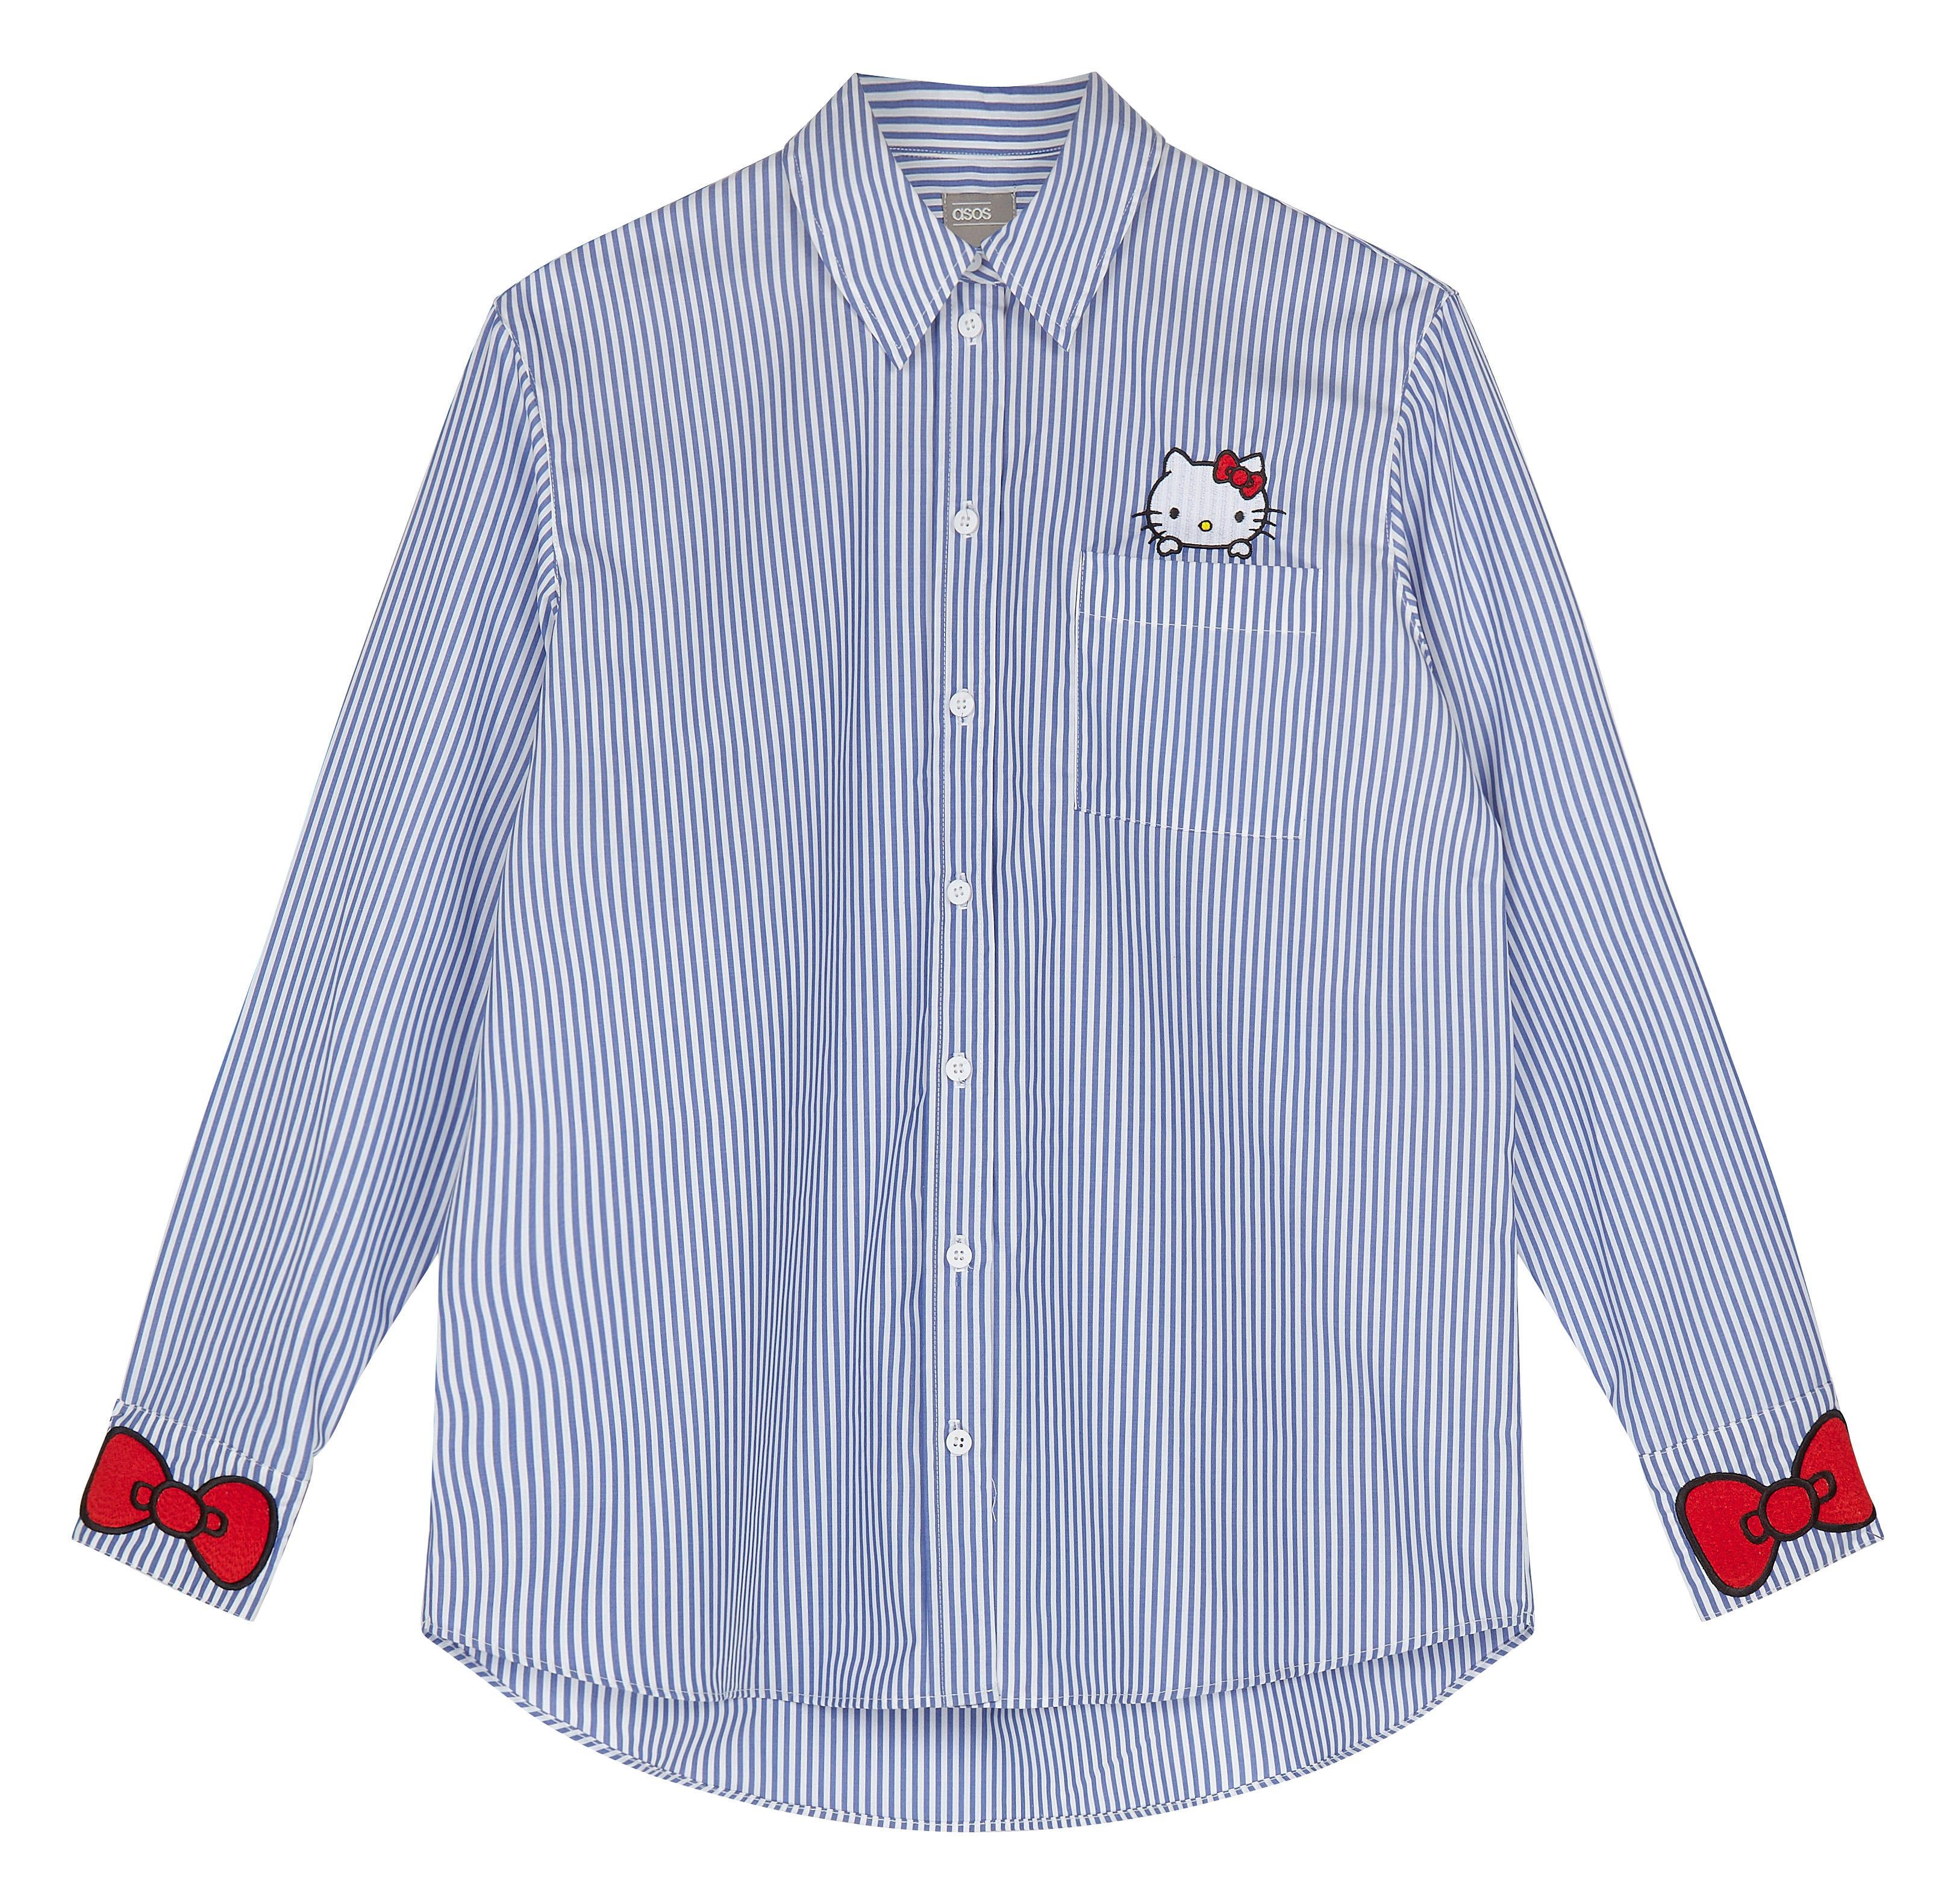 29c703ae8 Asos Hello Kitty Clothes Pajamas Accessories Gift Photo